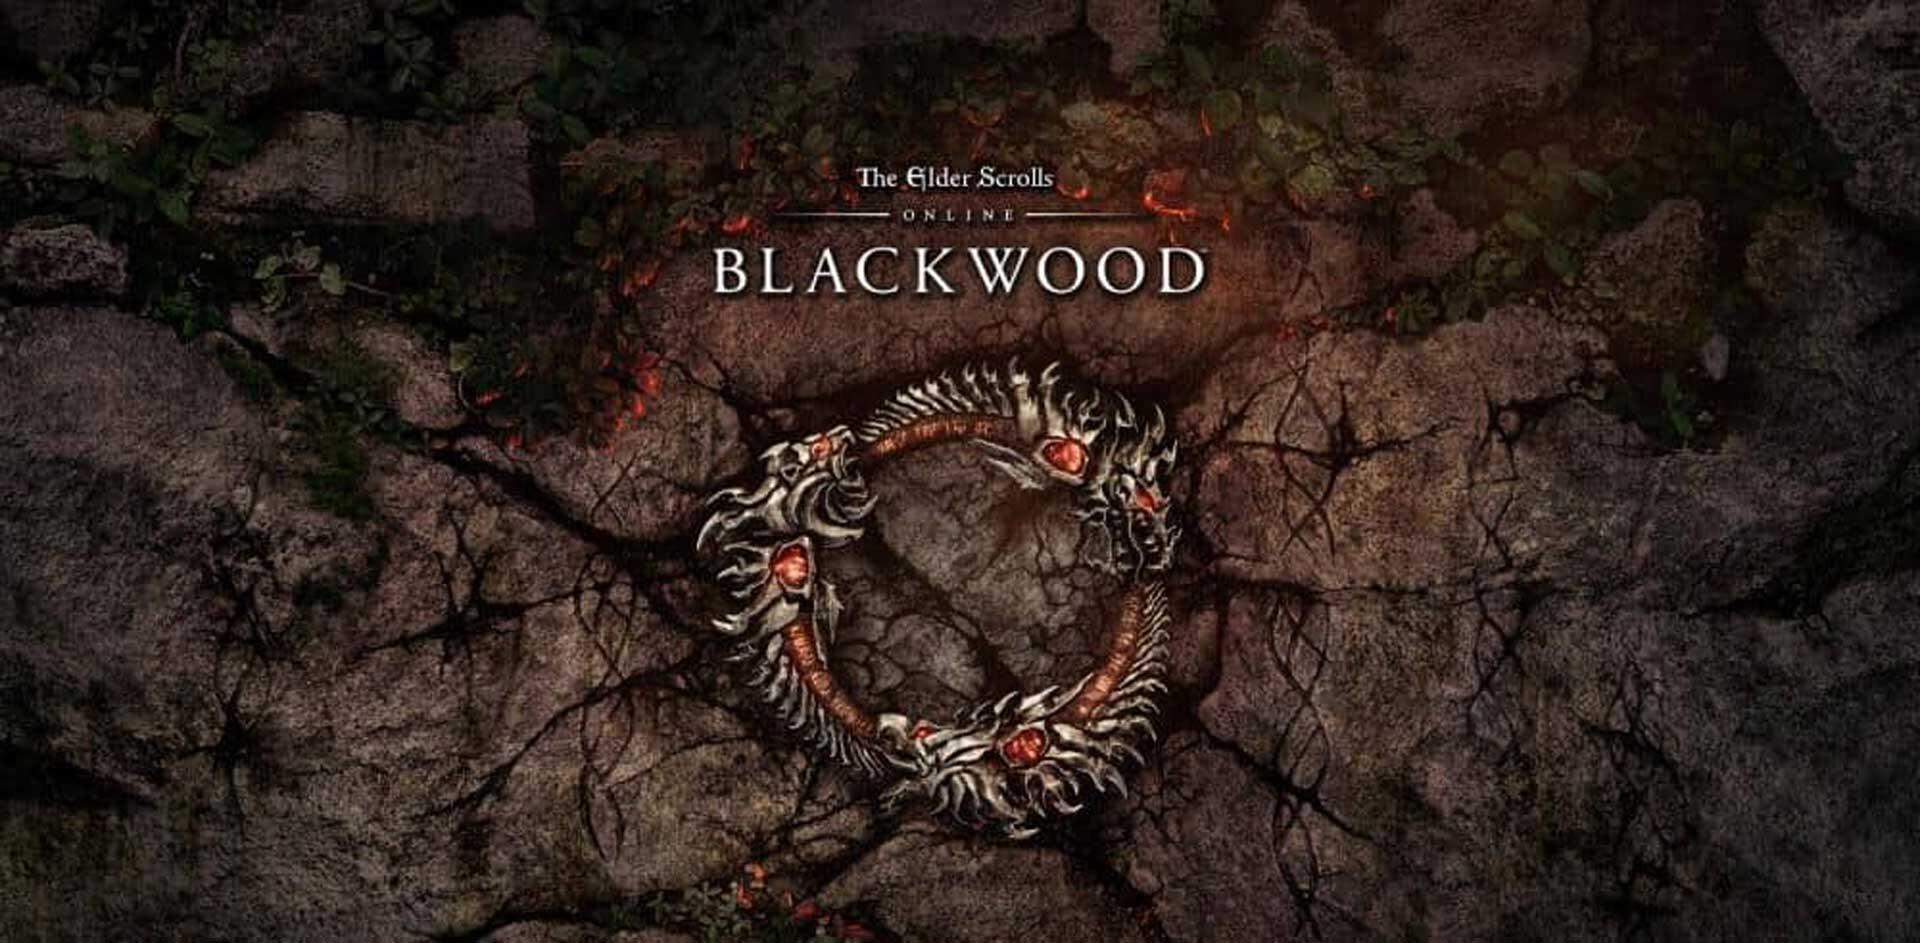 The Elder Scrolls Online Blackwood Gates of Oblivion Expansion Console Enhanced PS5 Xbox Series X